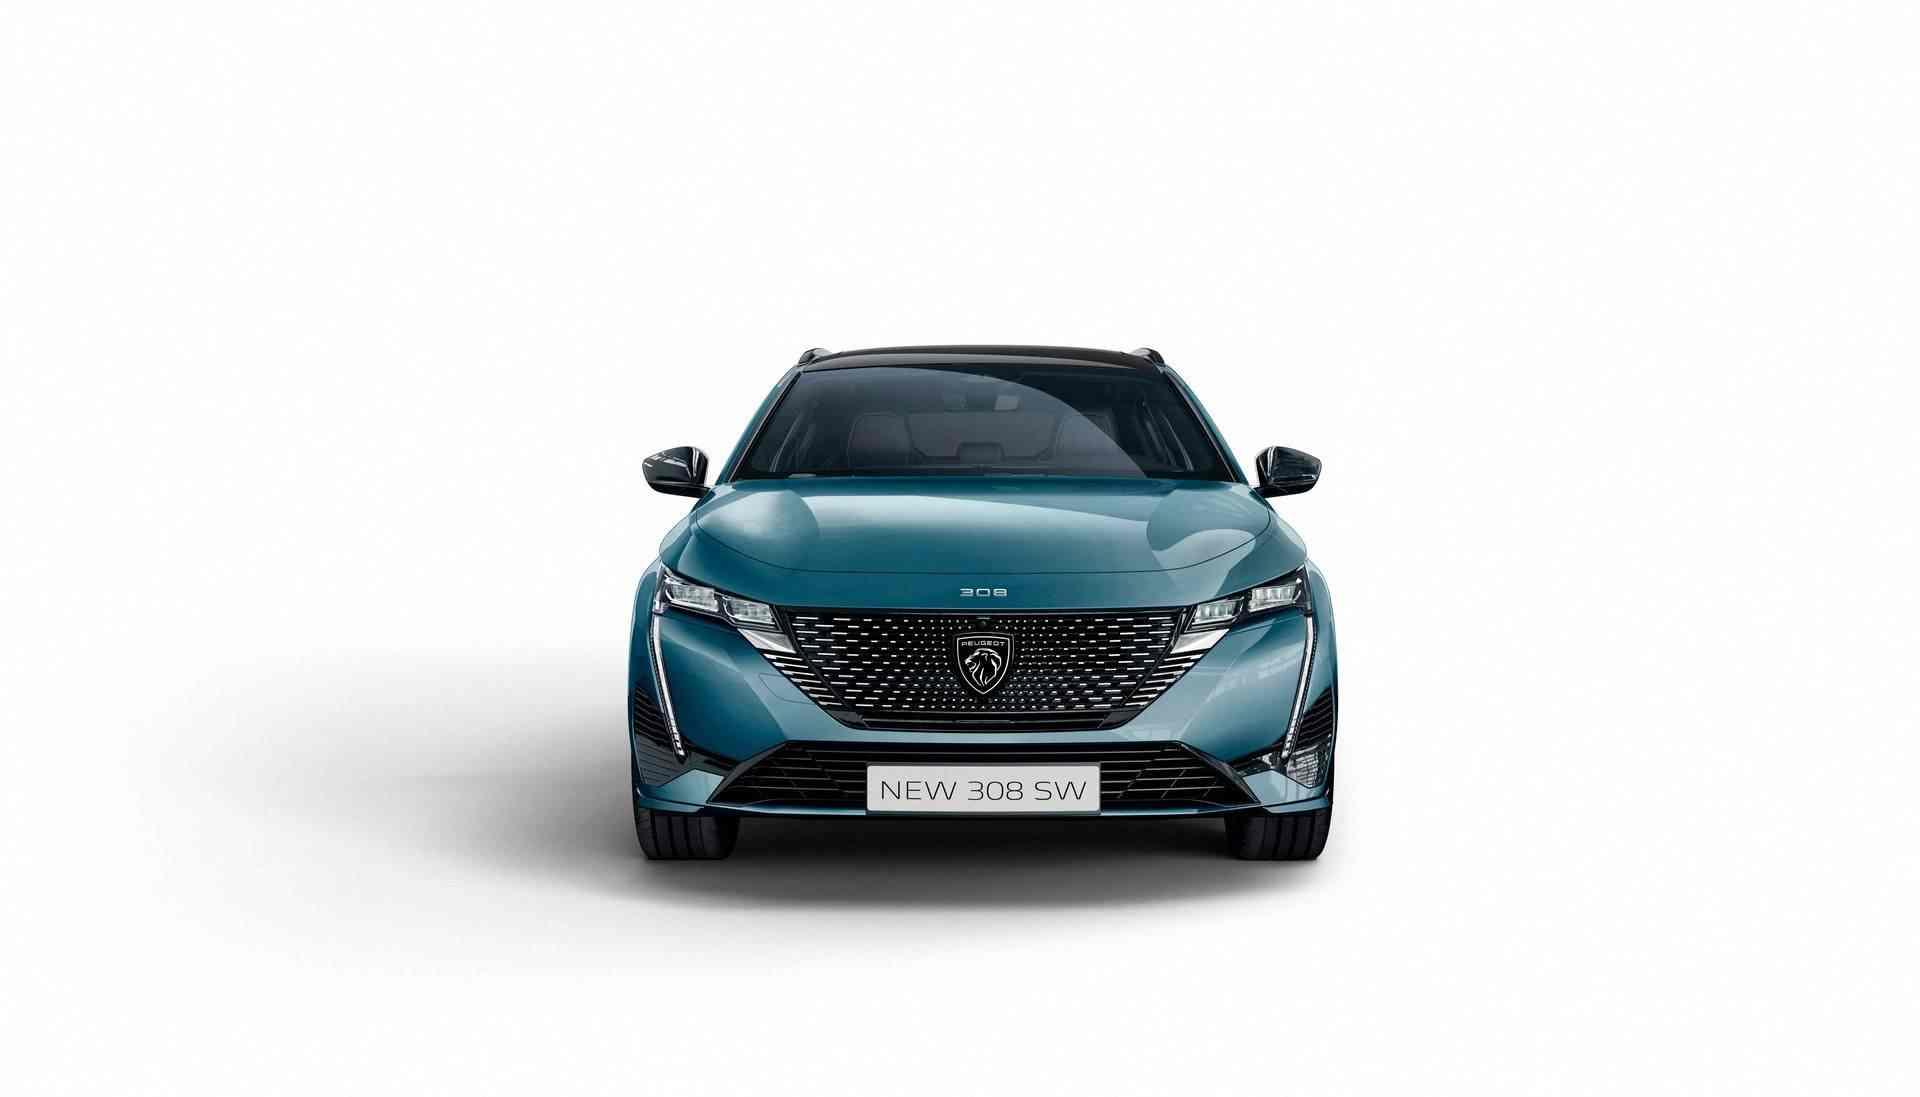 2022_Peugeot_308_SW-0007